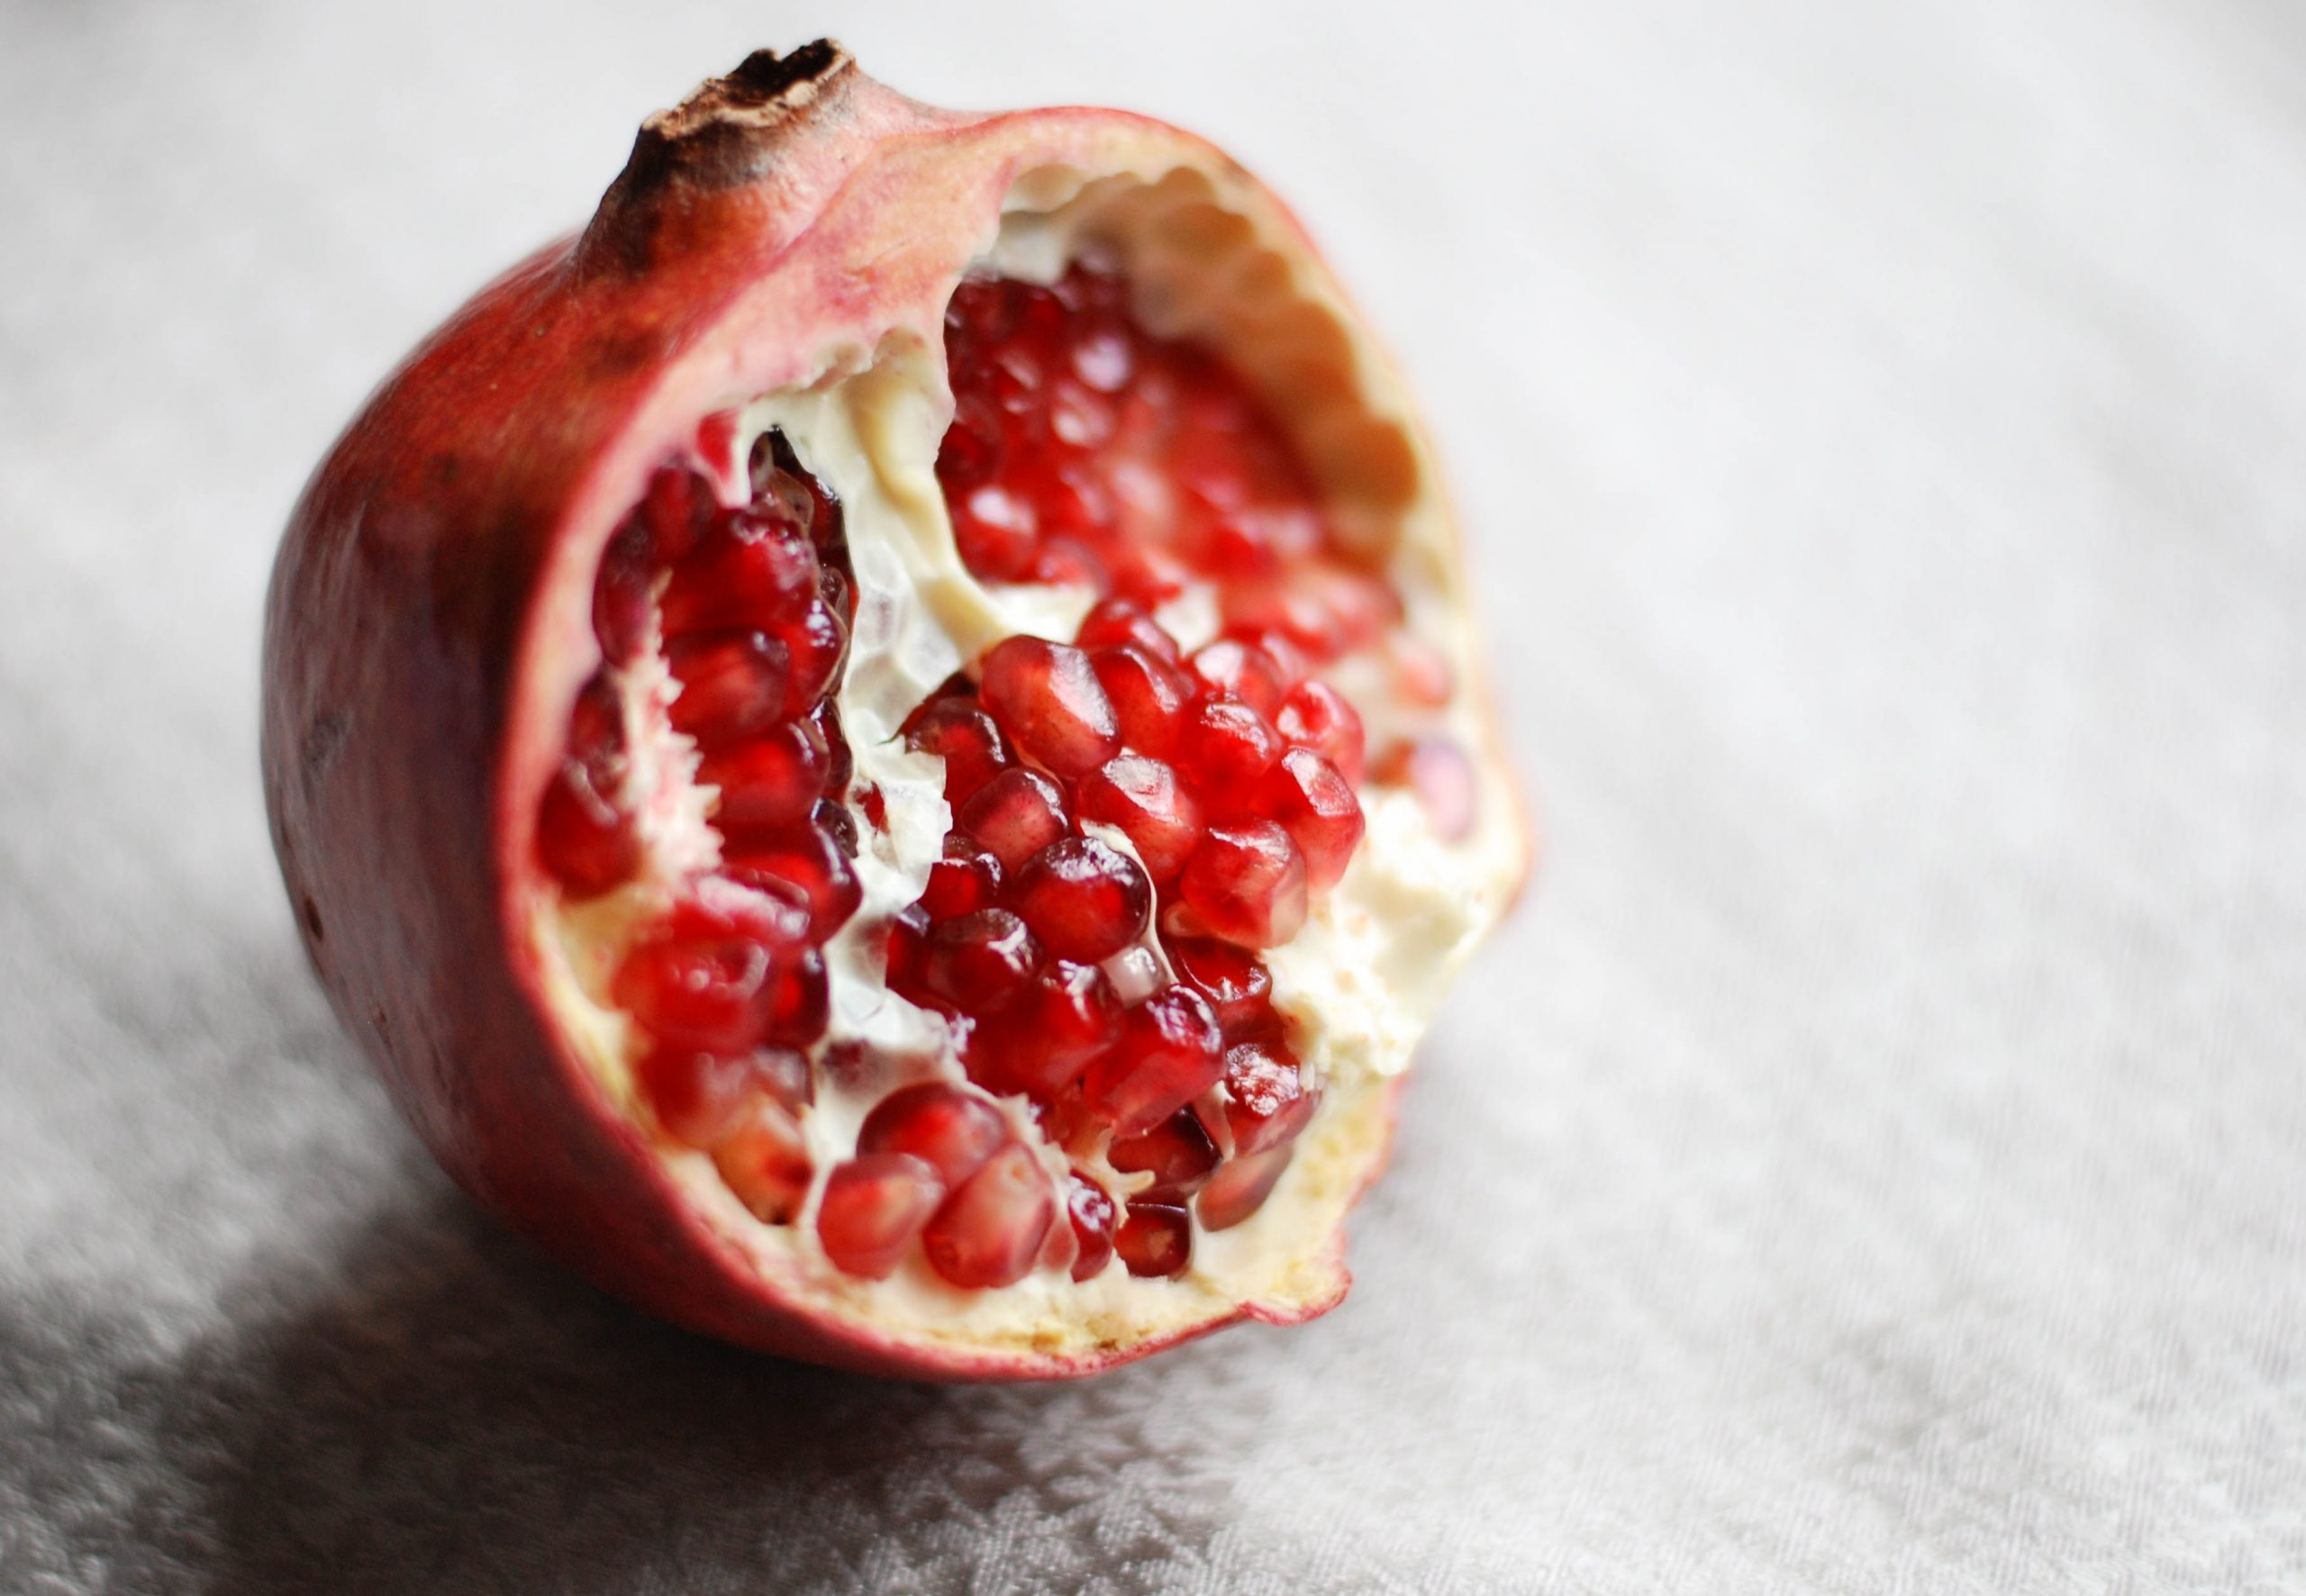 sliced orange and pomegranate fruits